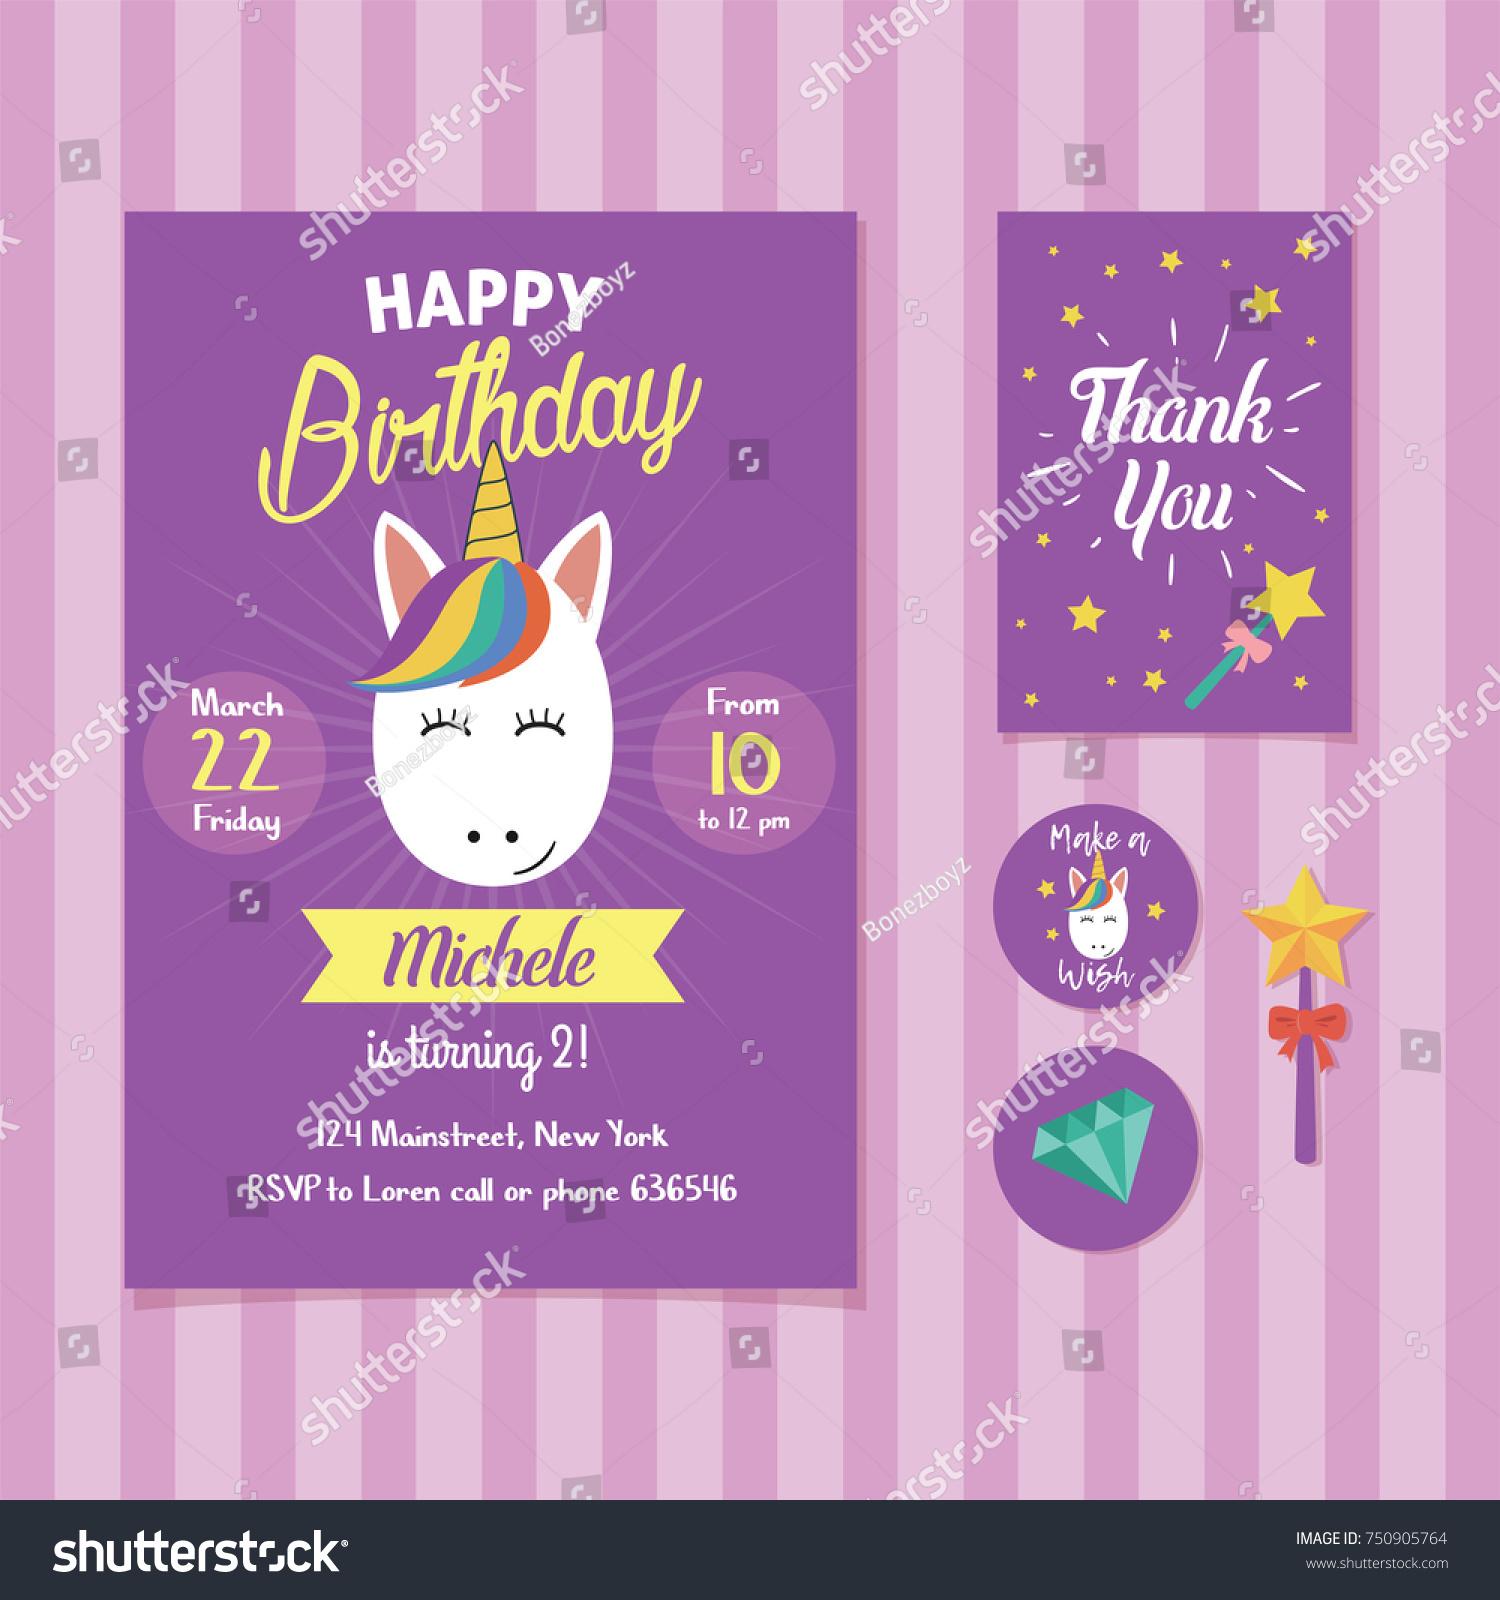 purple birthday invitation template